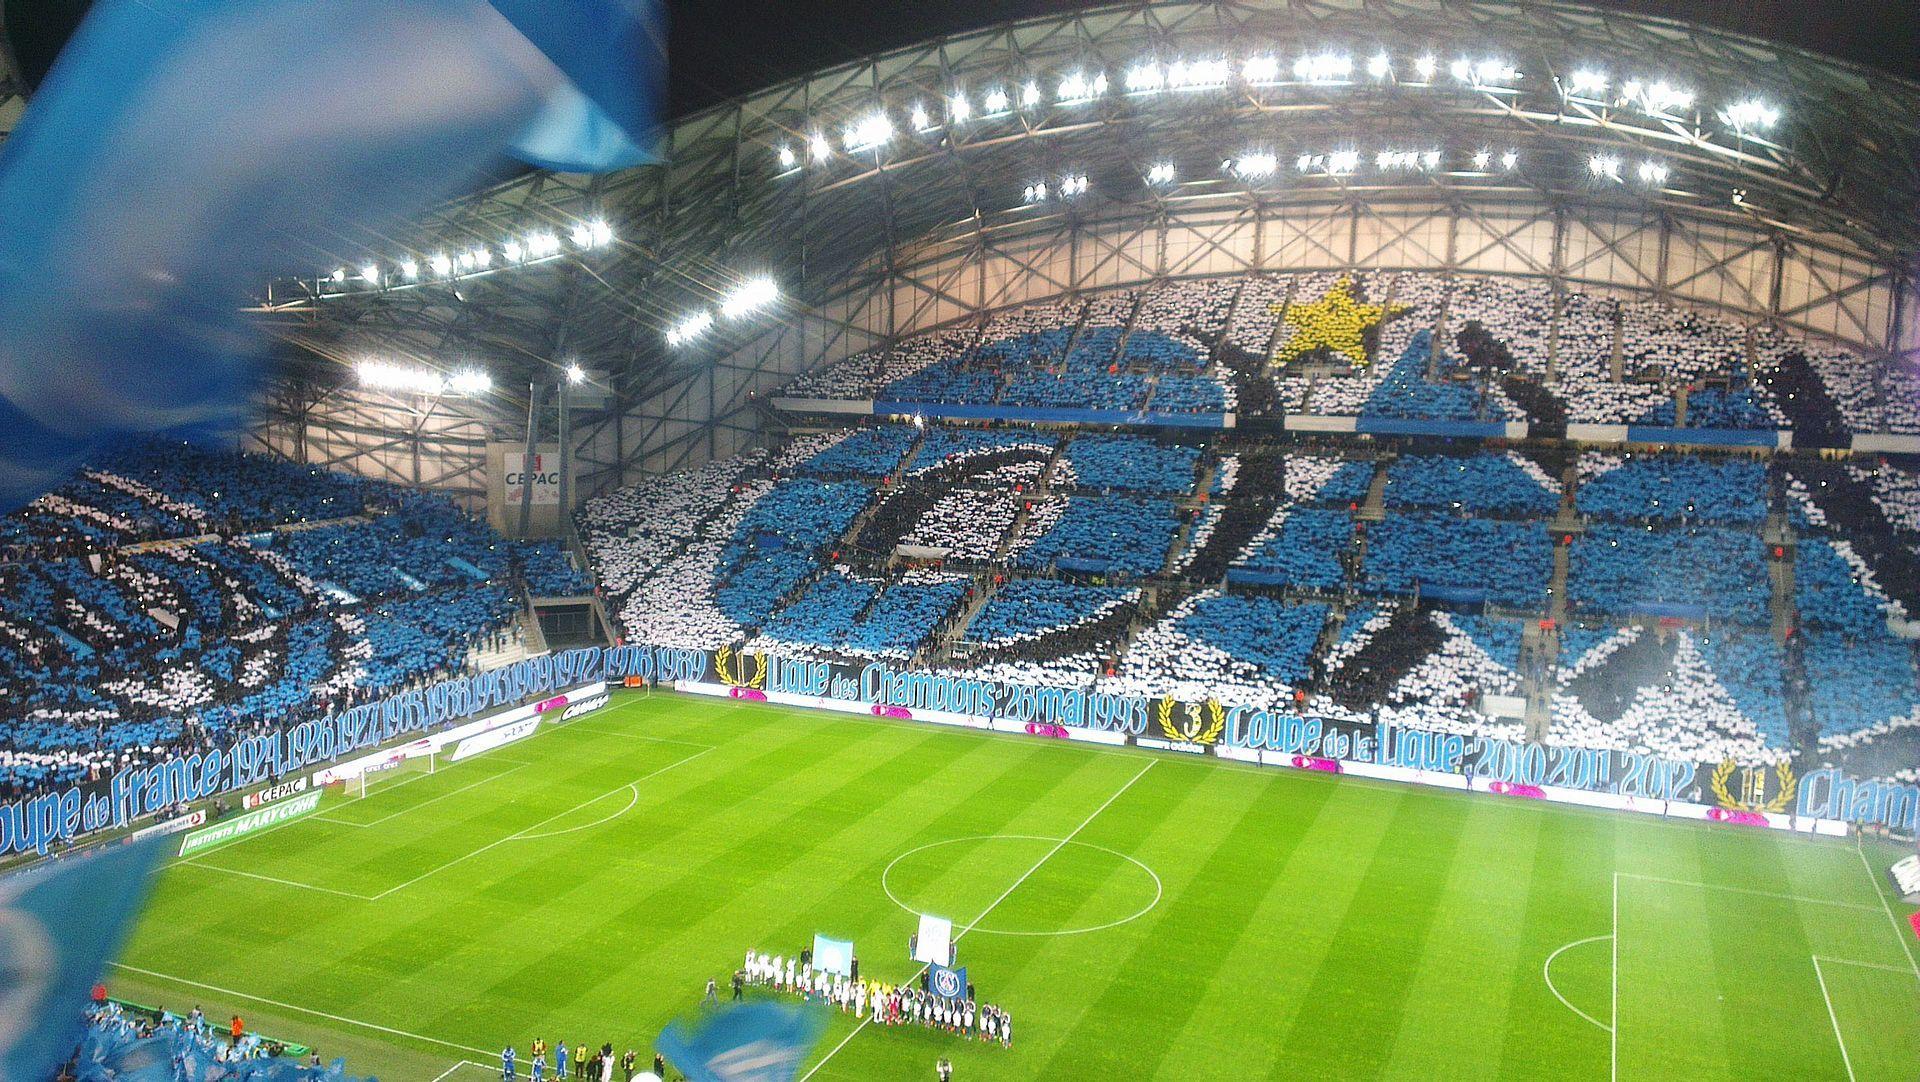 Marseille Stade Velodrome 13000 Olympique De Marseille